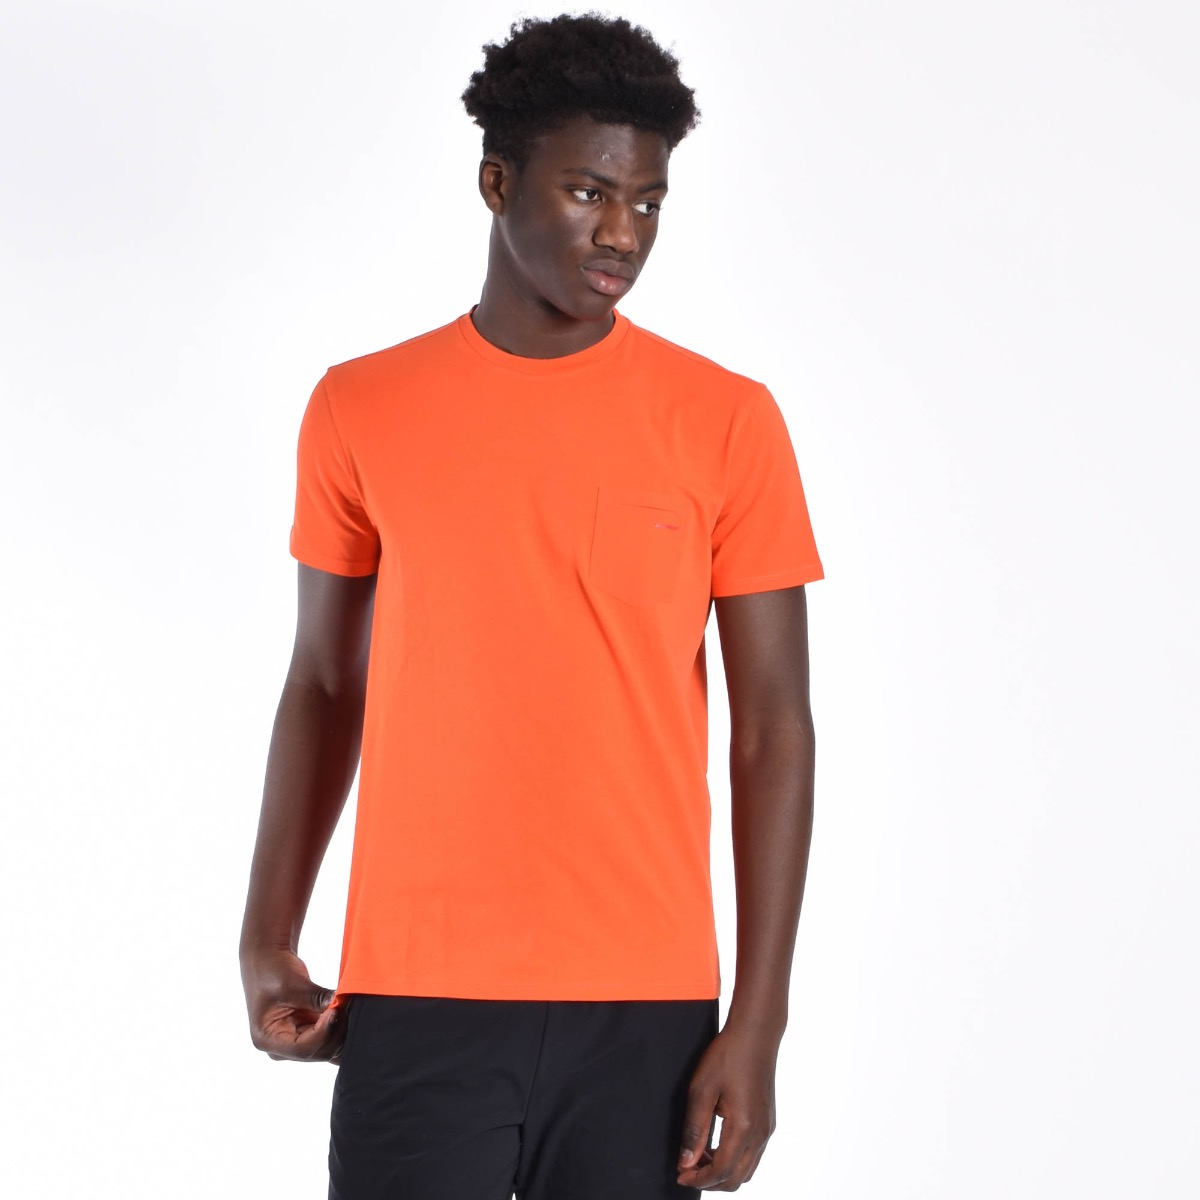 T-shirt con taschino - Arancione